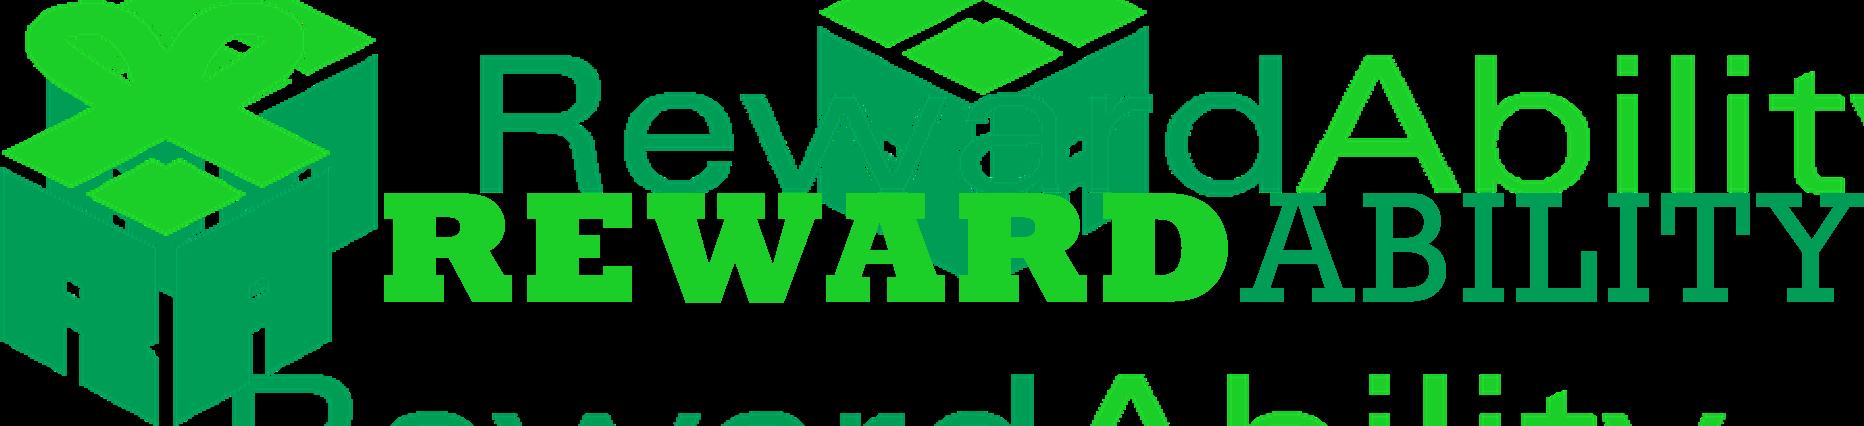 Yeaps RewardAbility Logo (Colored).png